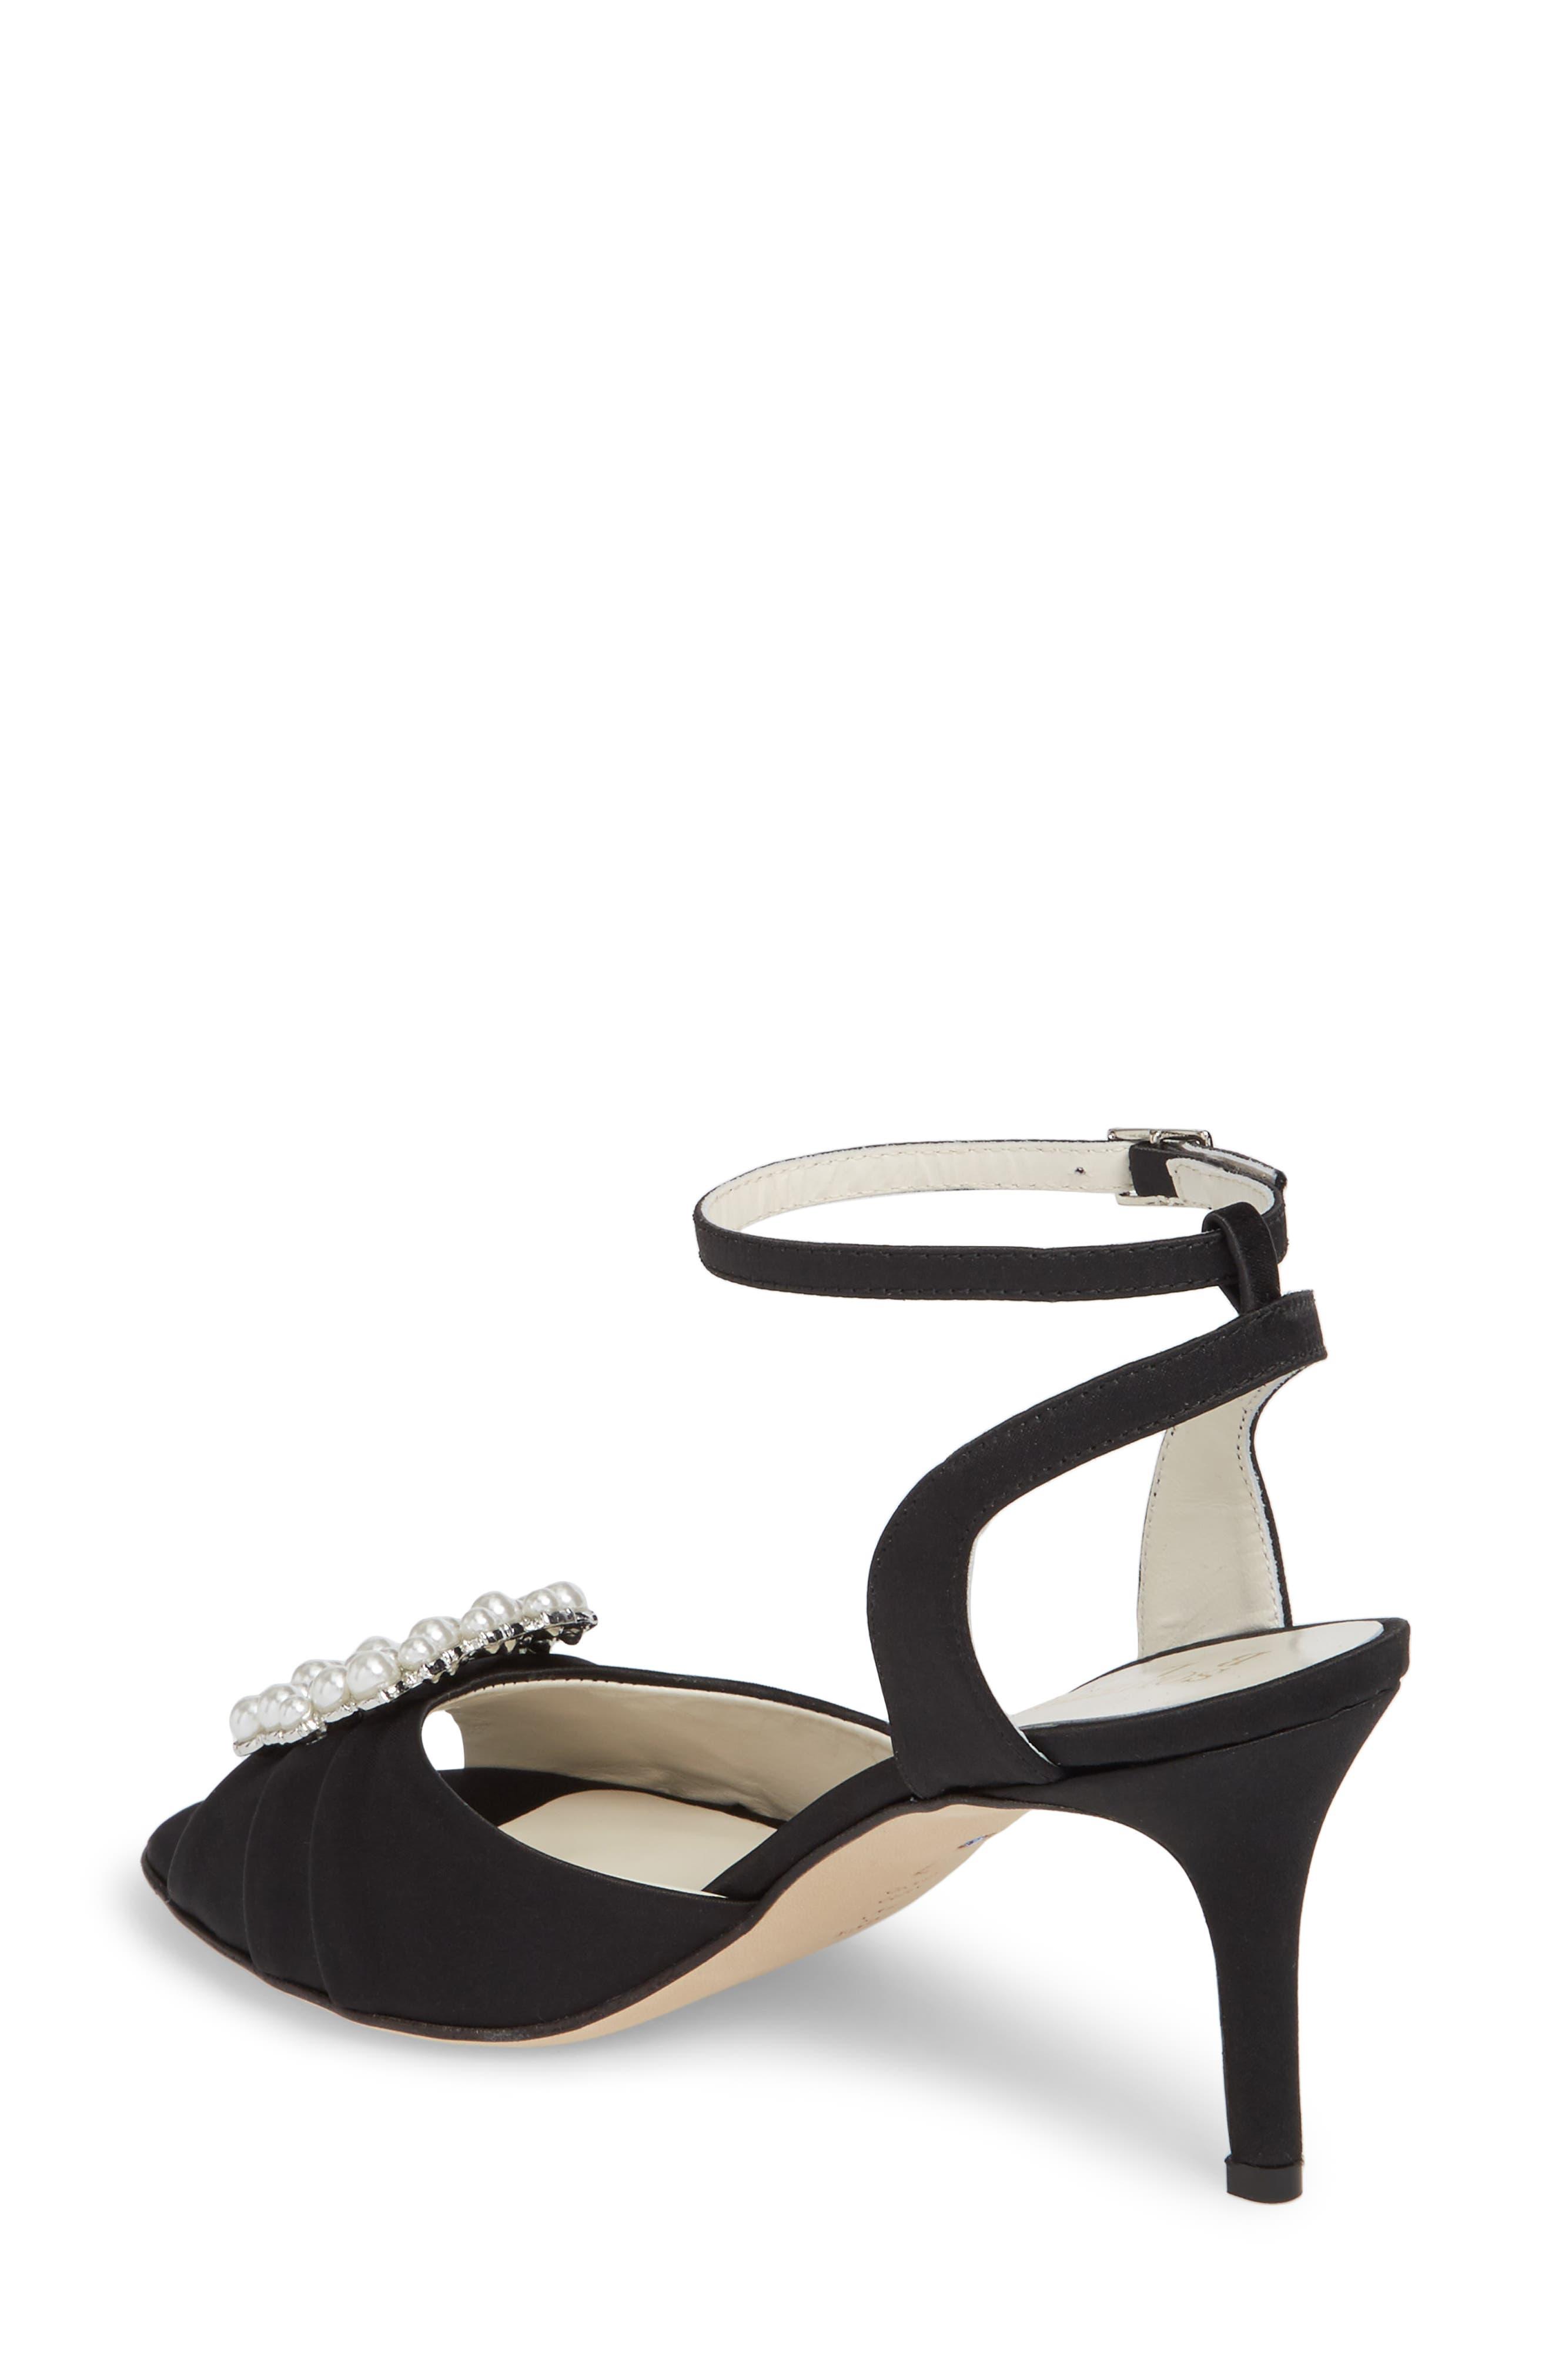 Godiva Imitation Pearl Buckle Sandal,                             Alternate thumbnail 2, color,                             BLACK SATIN